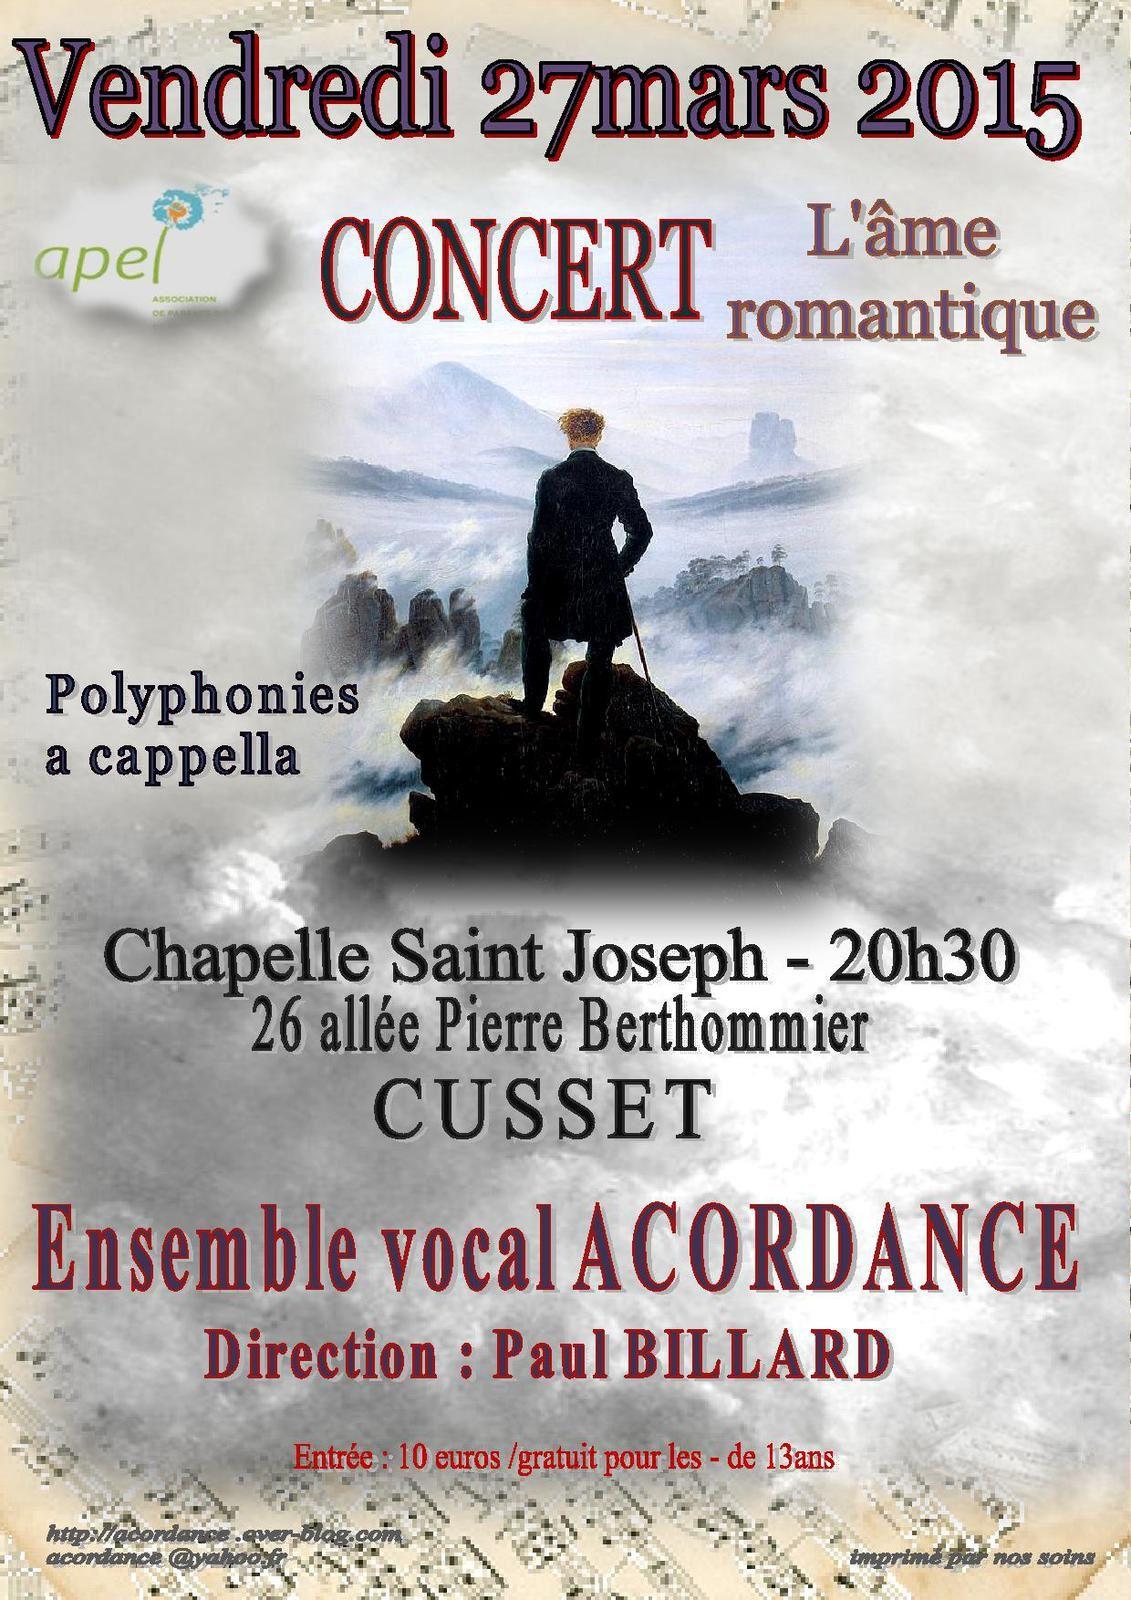 Concert du 27 mars 2015